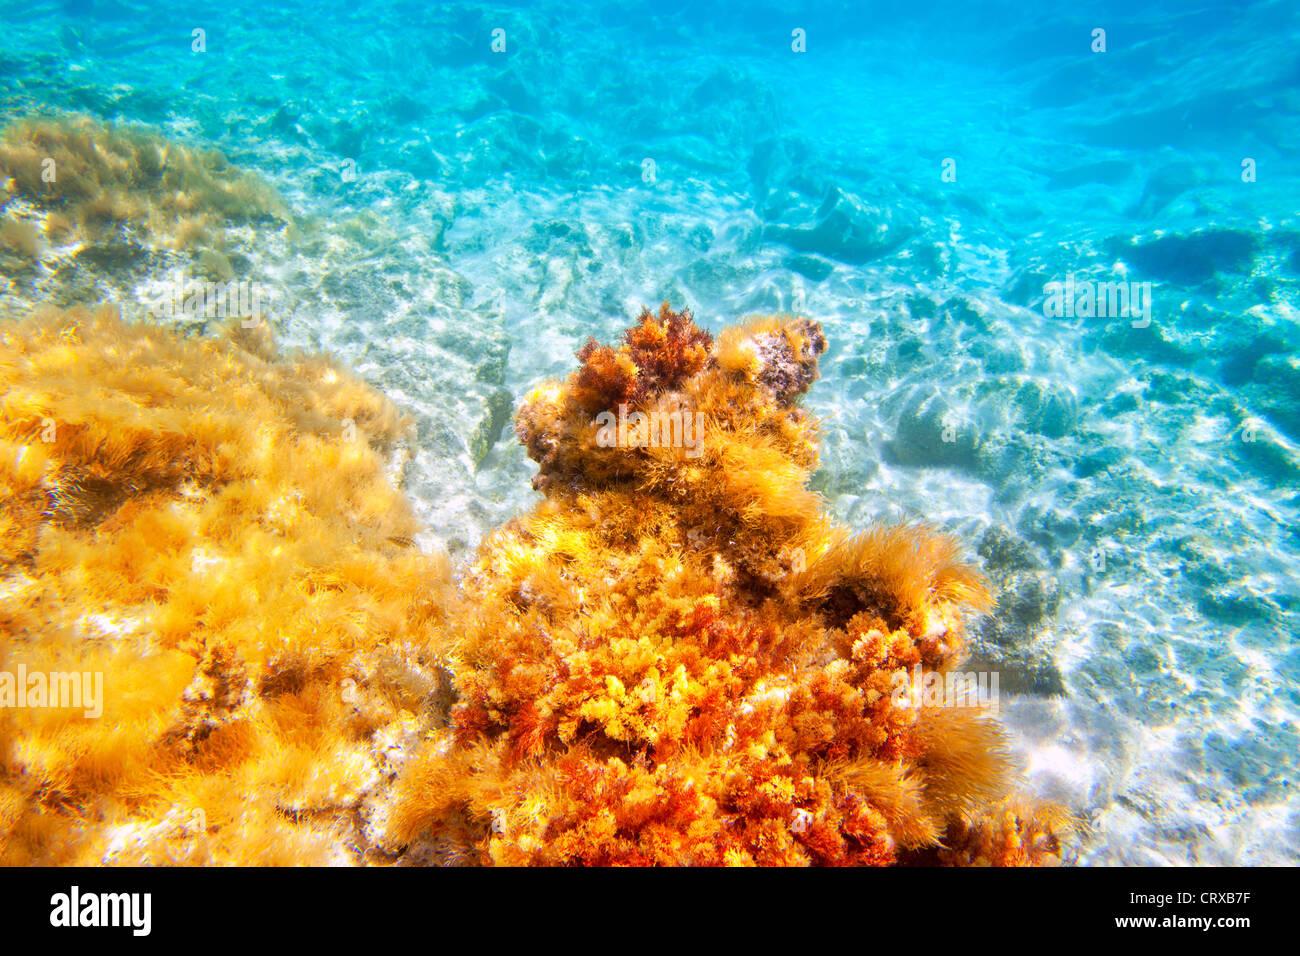 Baearic islands underwater sea bottom snorkeling view - Stock Image